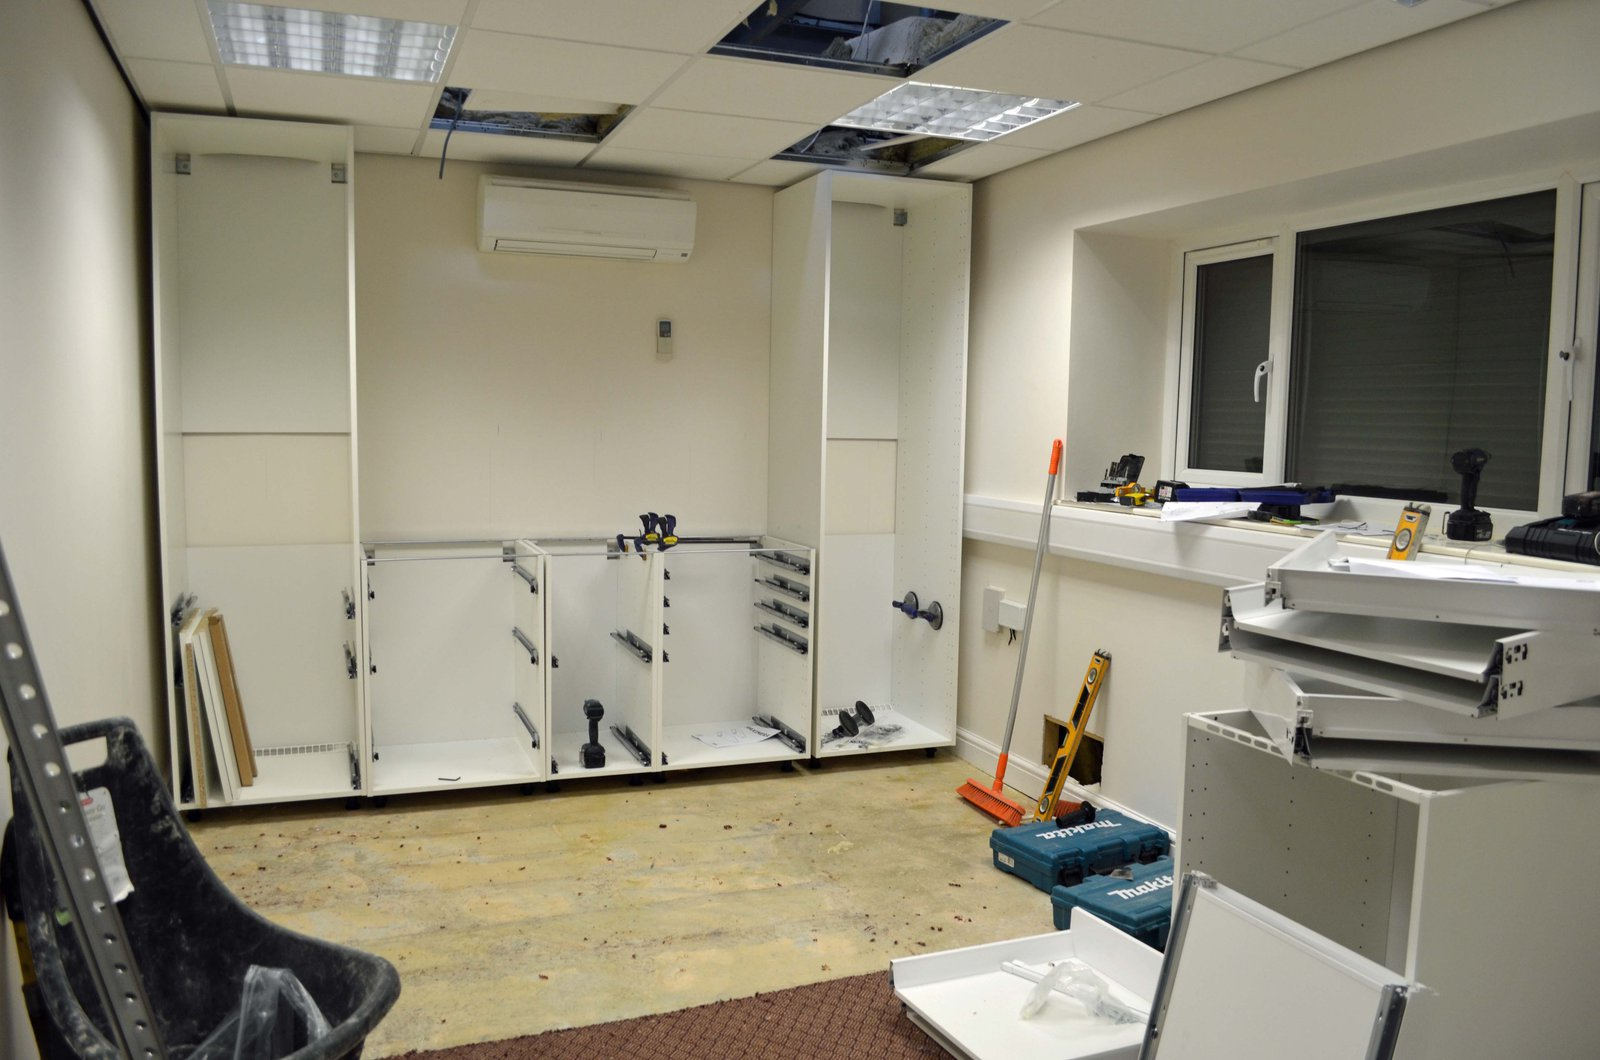 Studio kitchen started